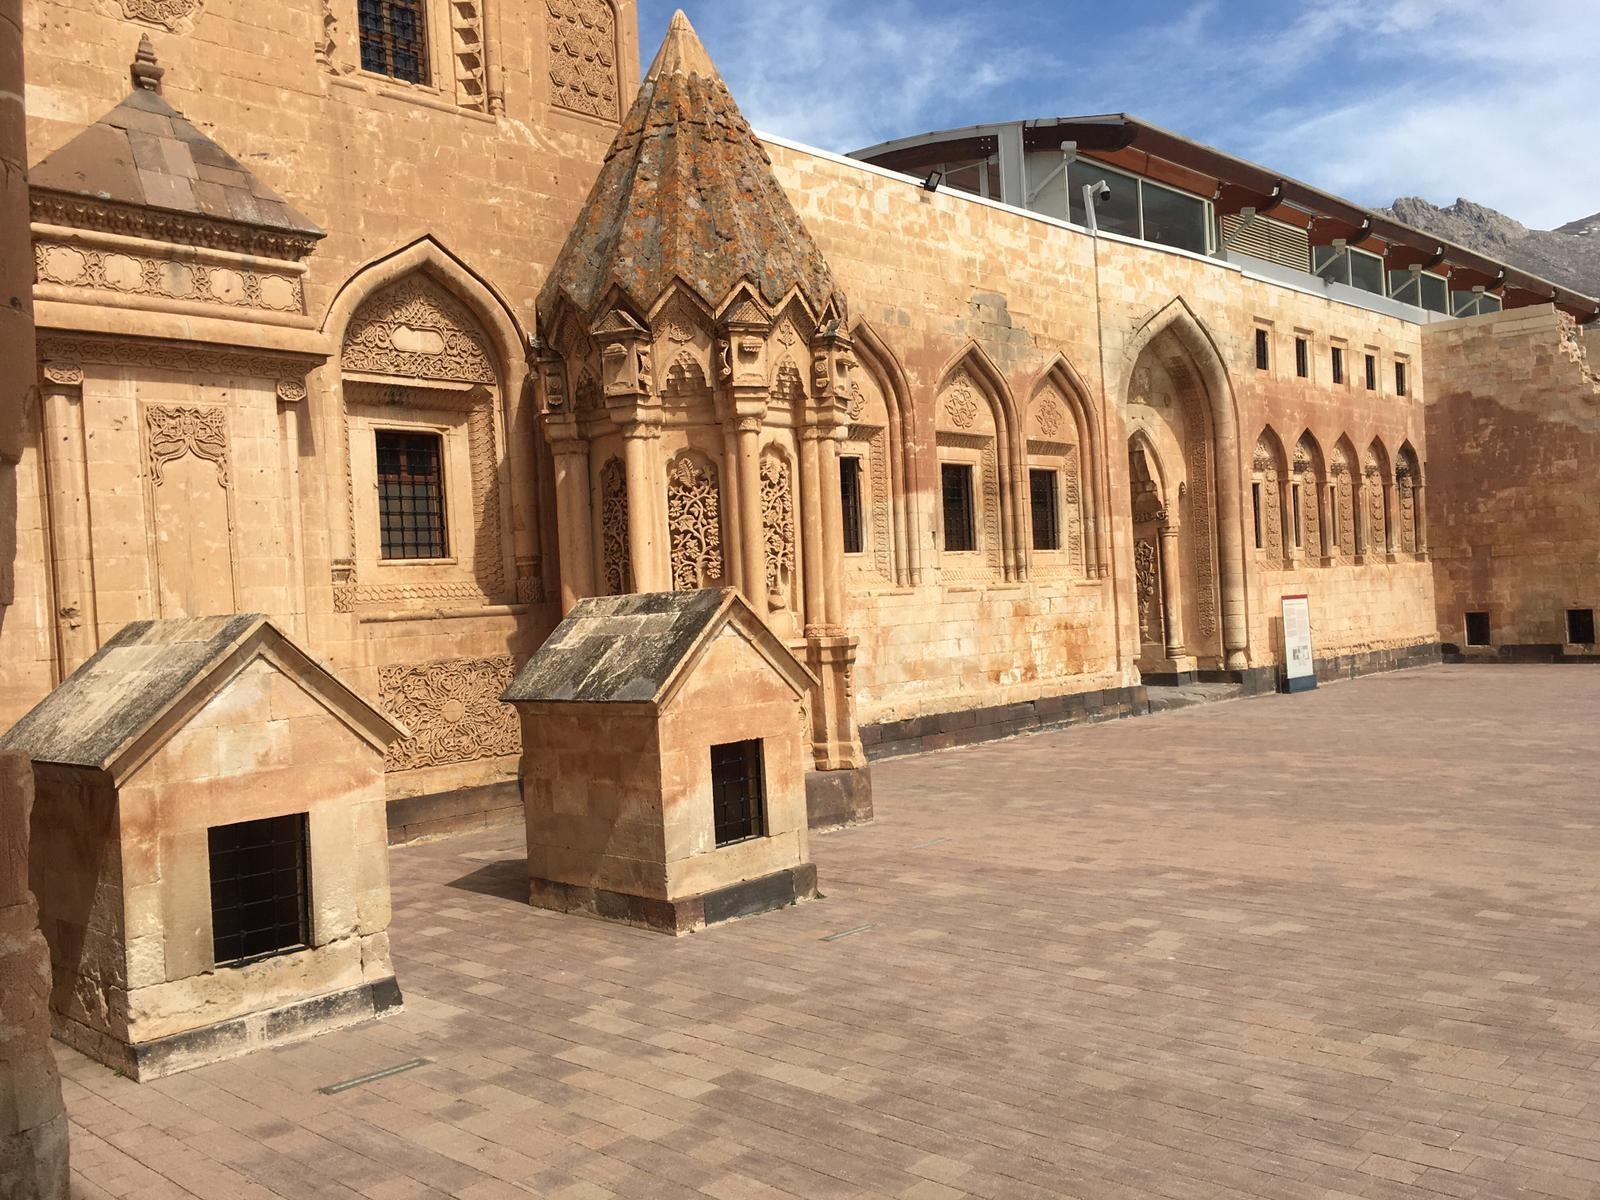 Tarihi İshak Paşa Sarayı